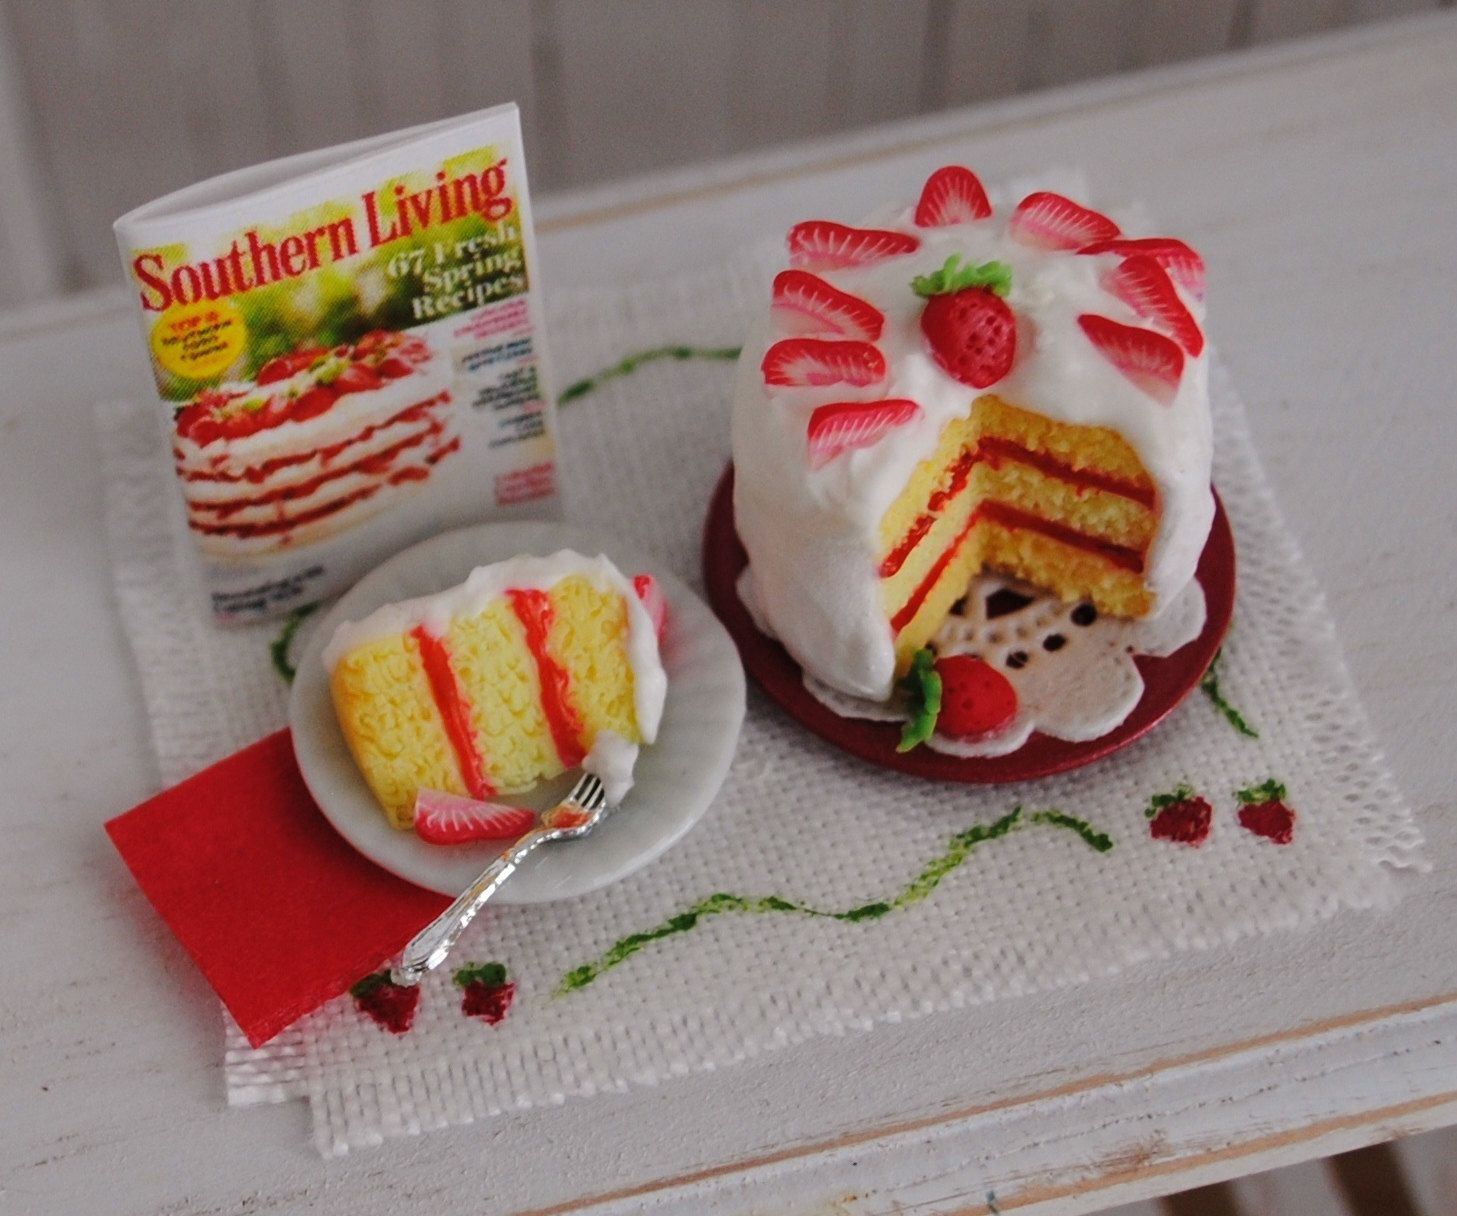 Miniature Strawberry Shortcake